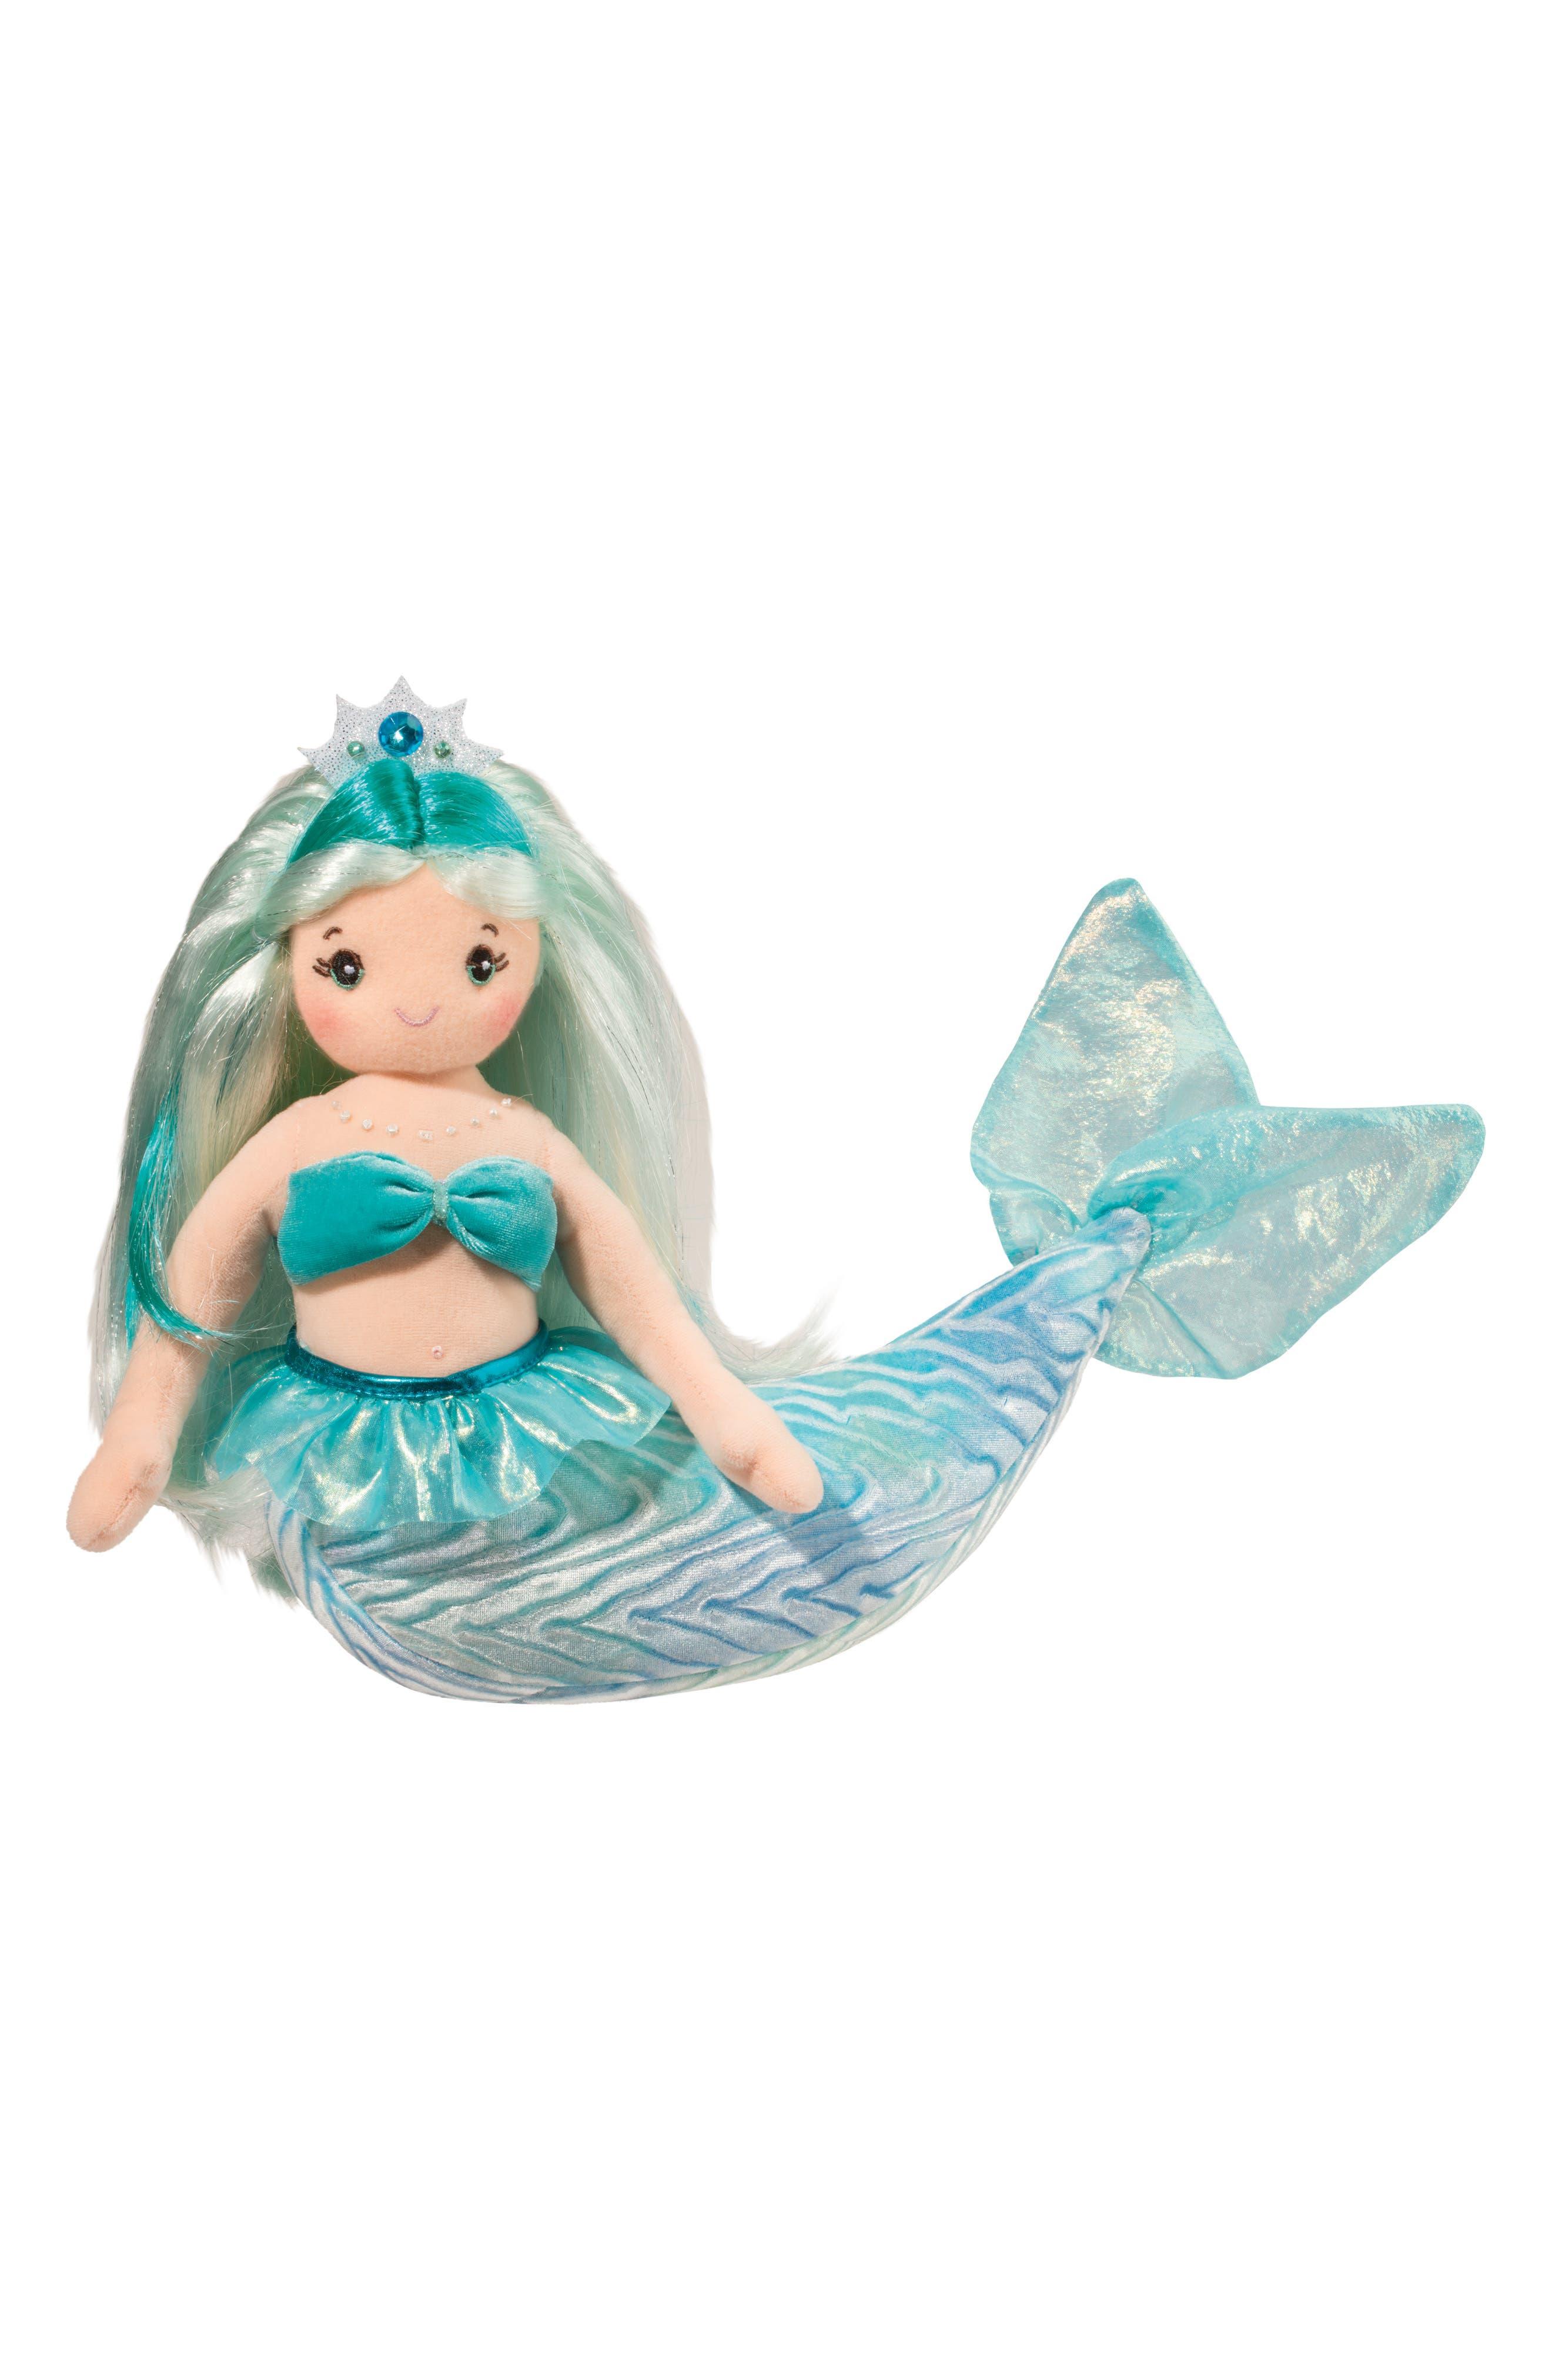 Douglas Ciara - Large Aqua Mermaid Doll